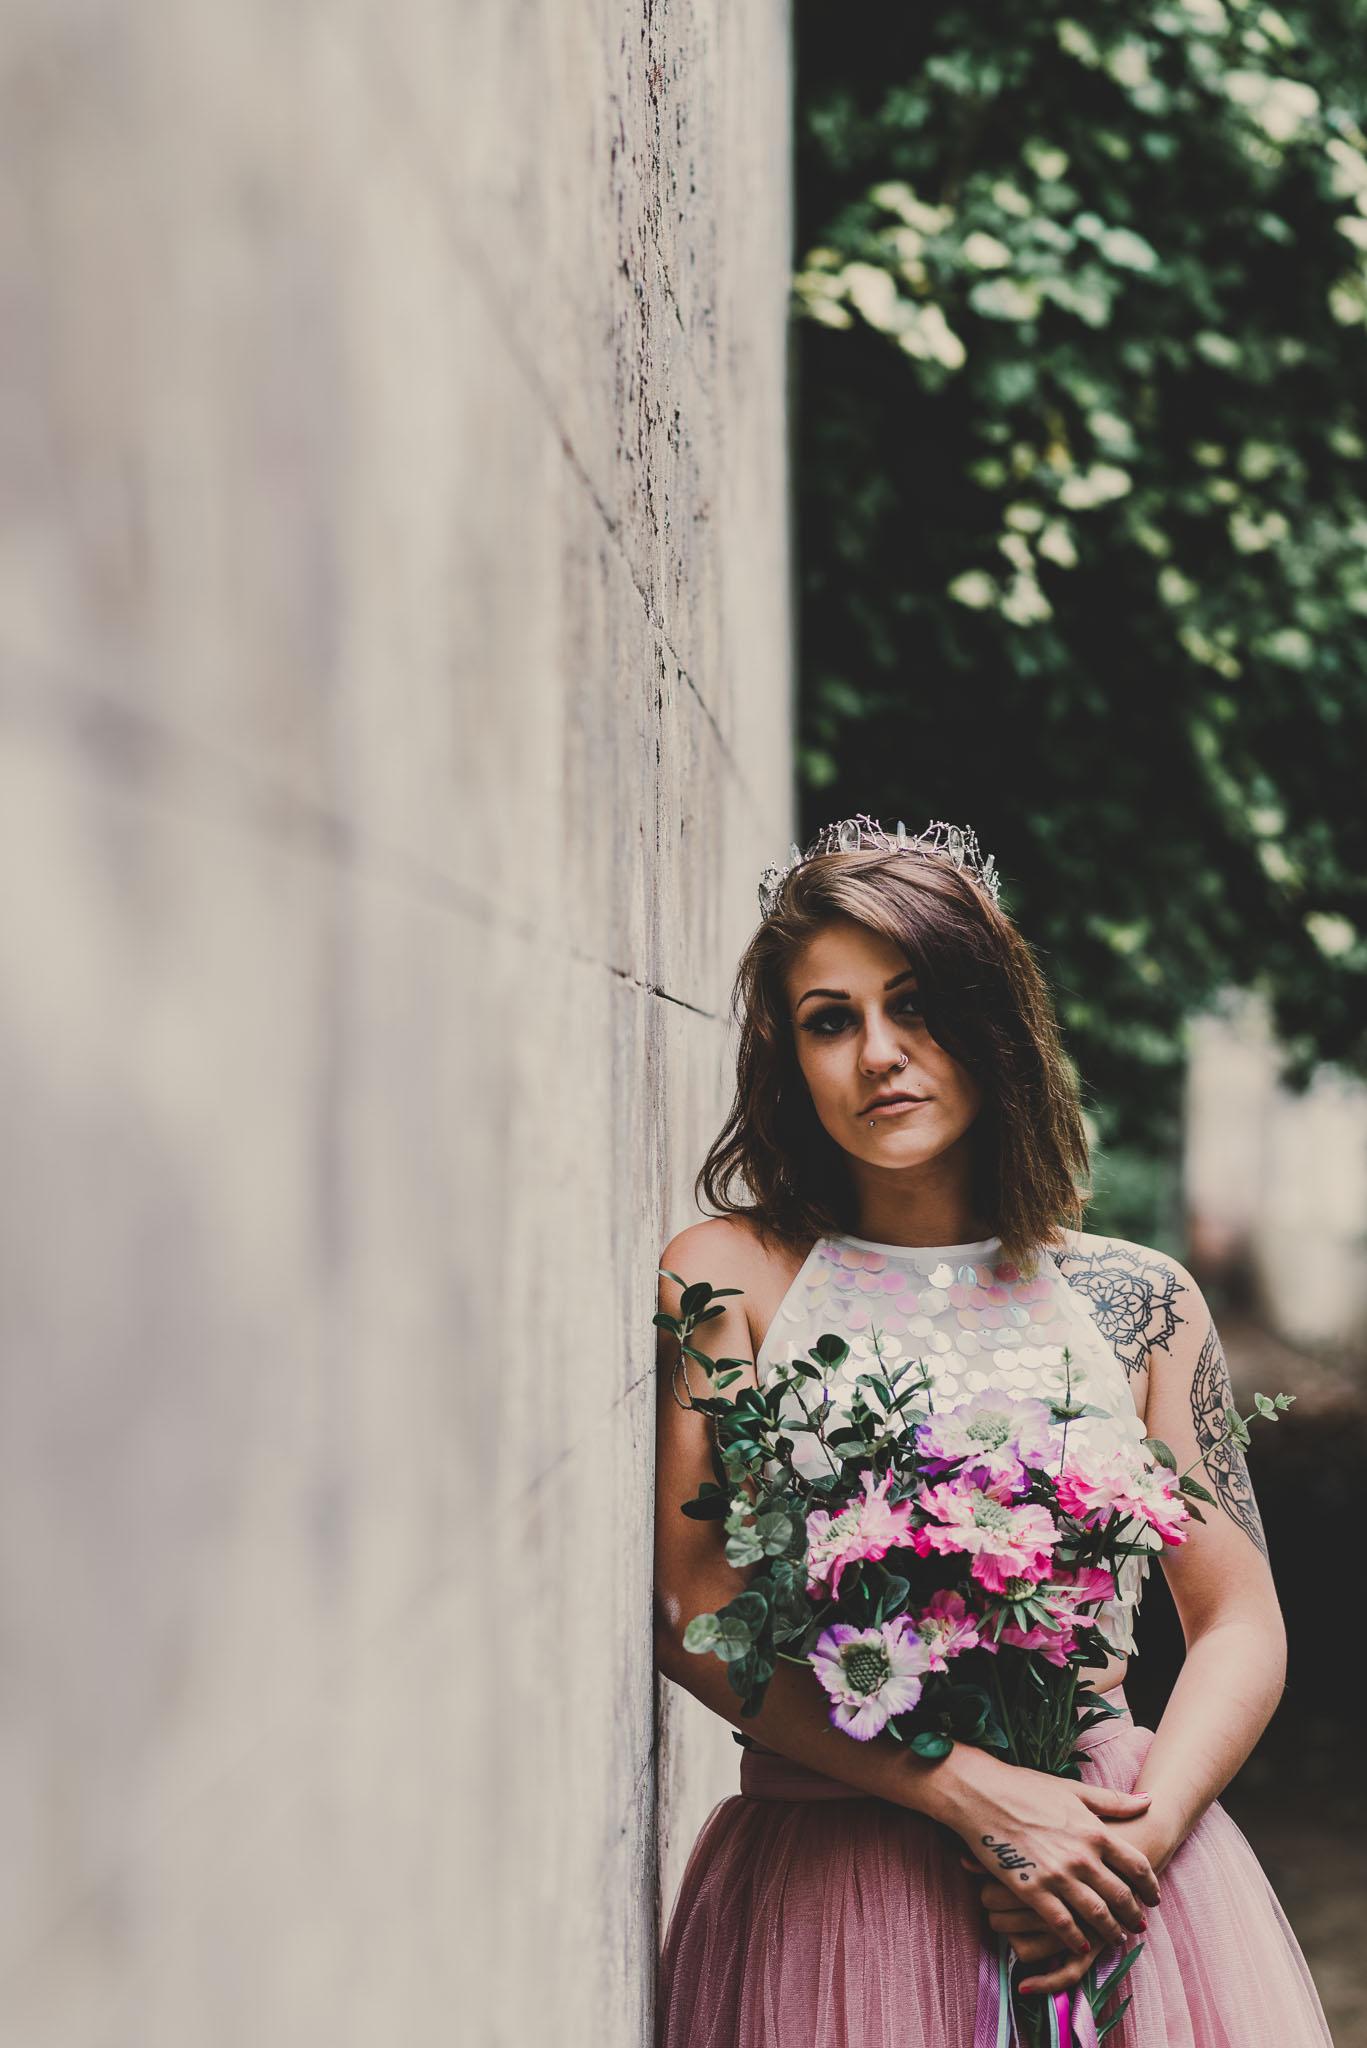 alternative-wedding-photography-in-liverpool-of-boho-bride (5).jpg